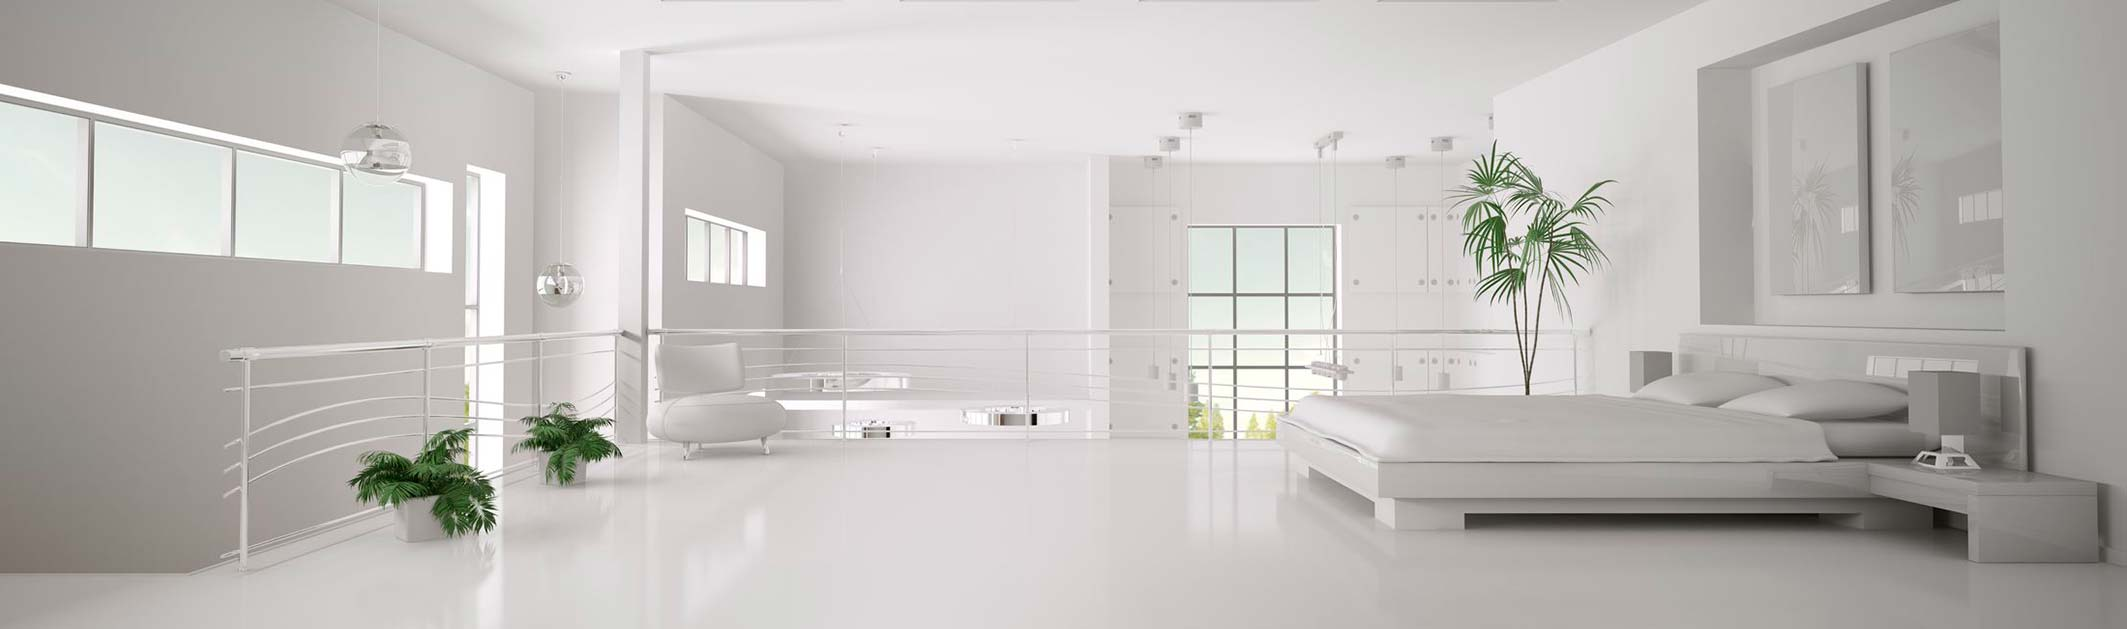 Entreprise de rénovation isolation platrerie Grenoble